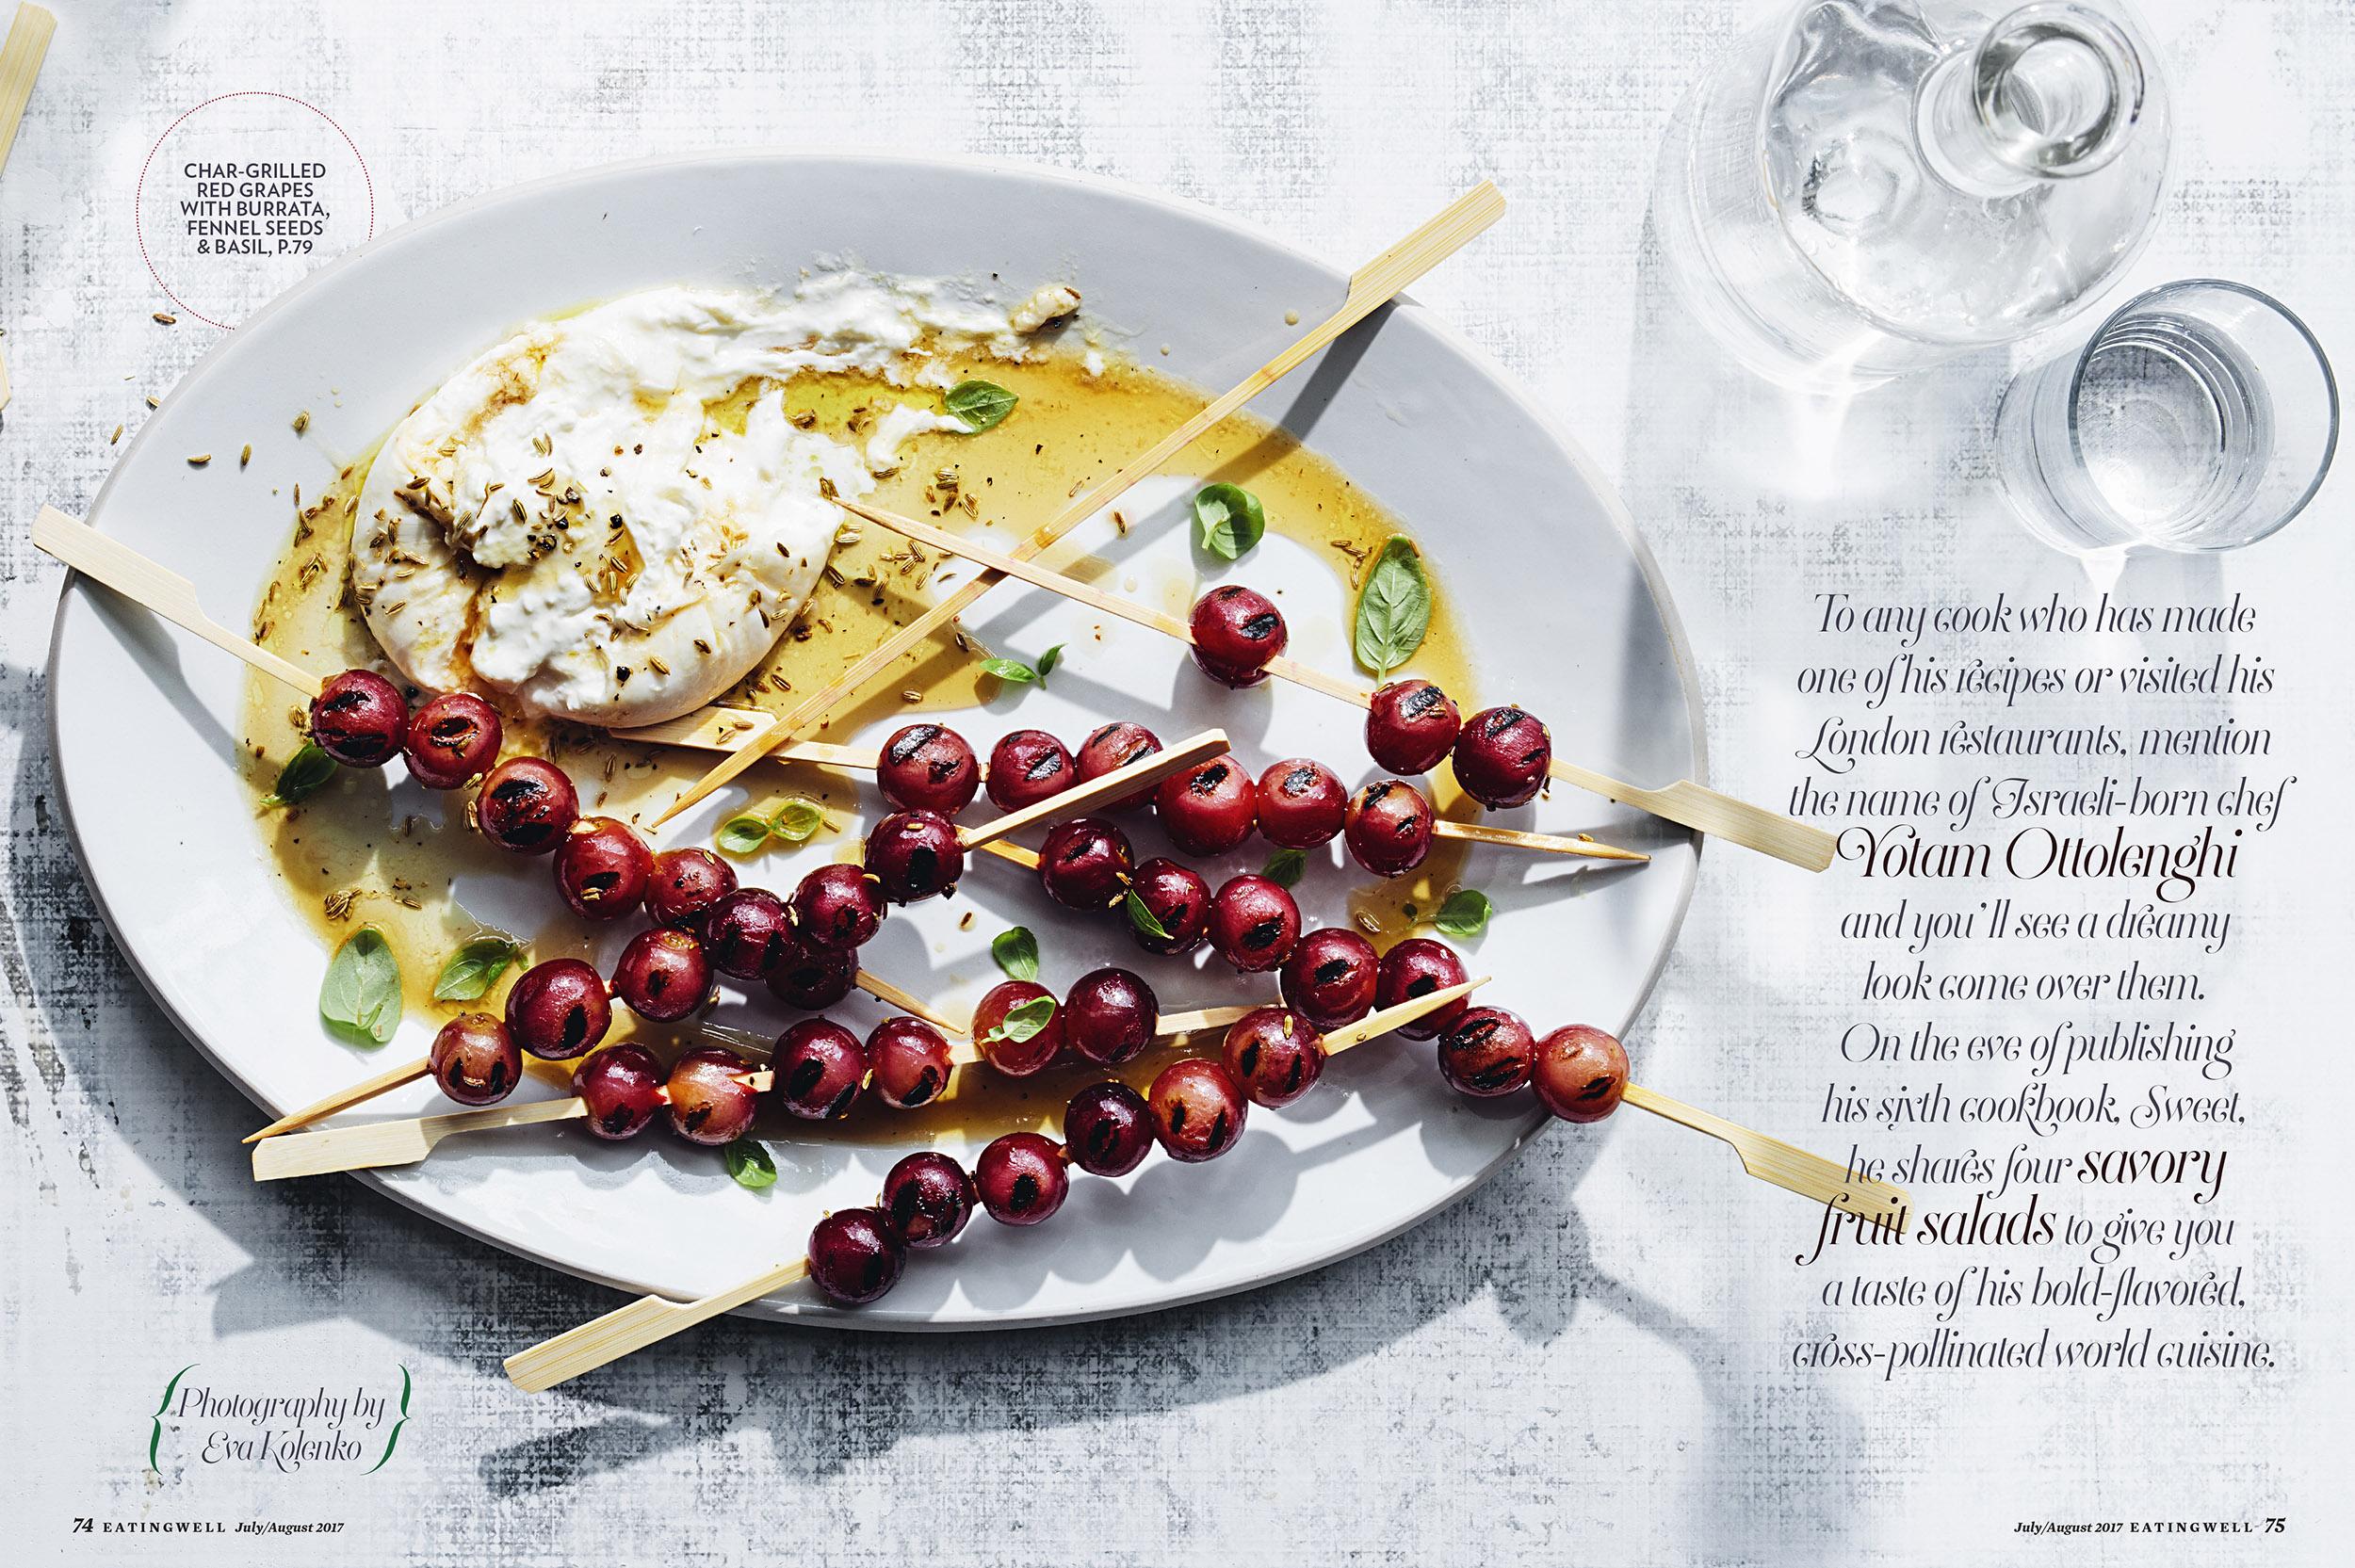 074-079 EW_JA17_feature_Fruit Salads QFCCcx-1 copy.jpg